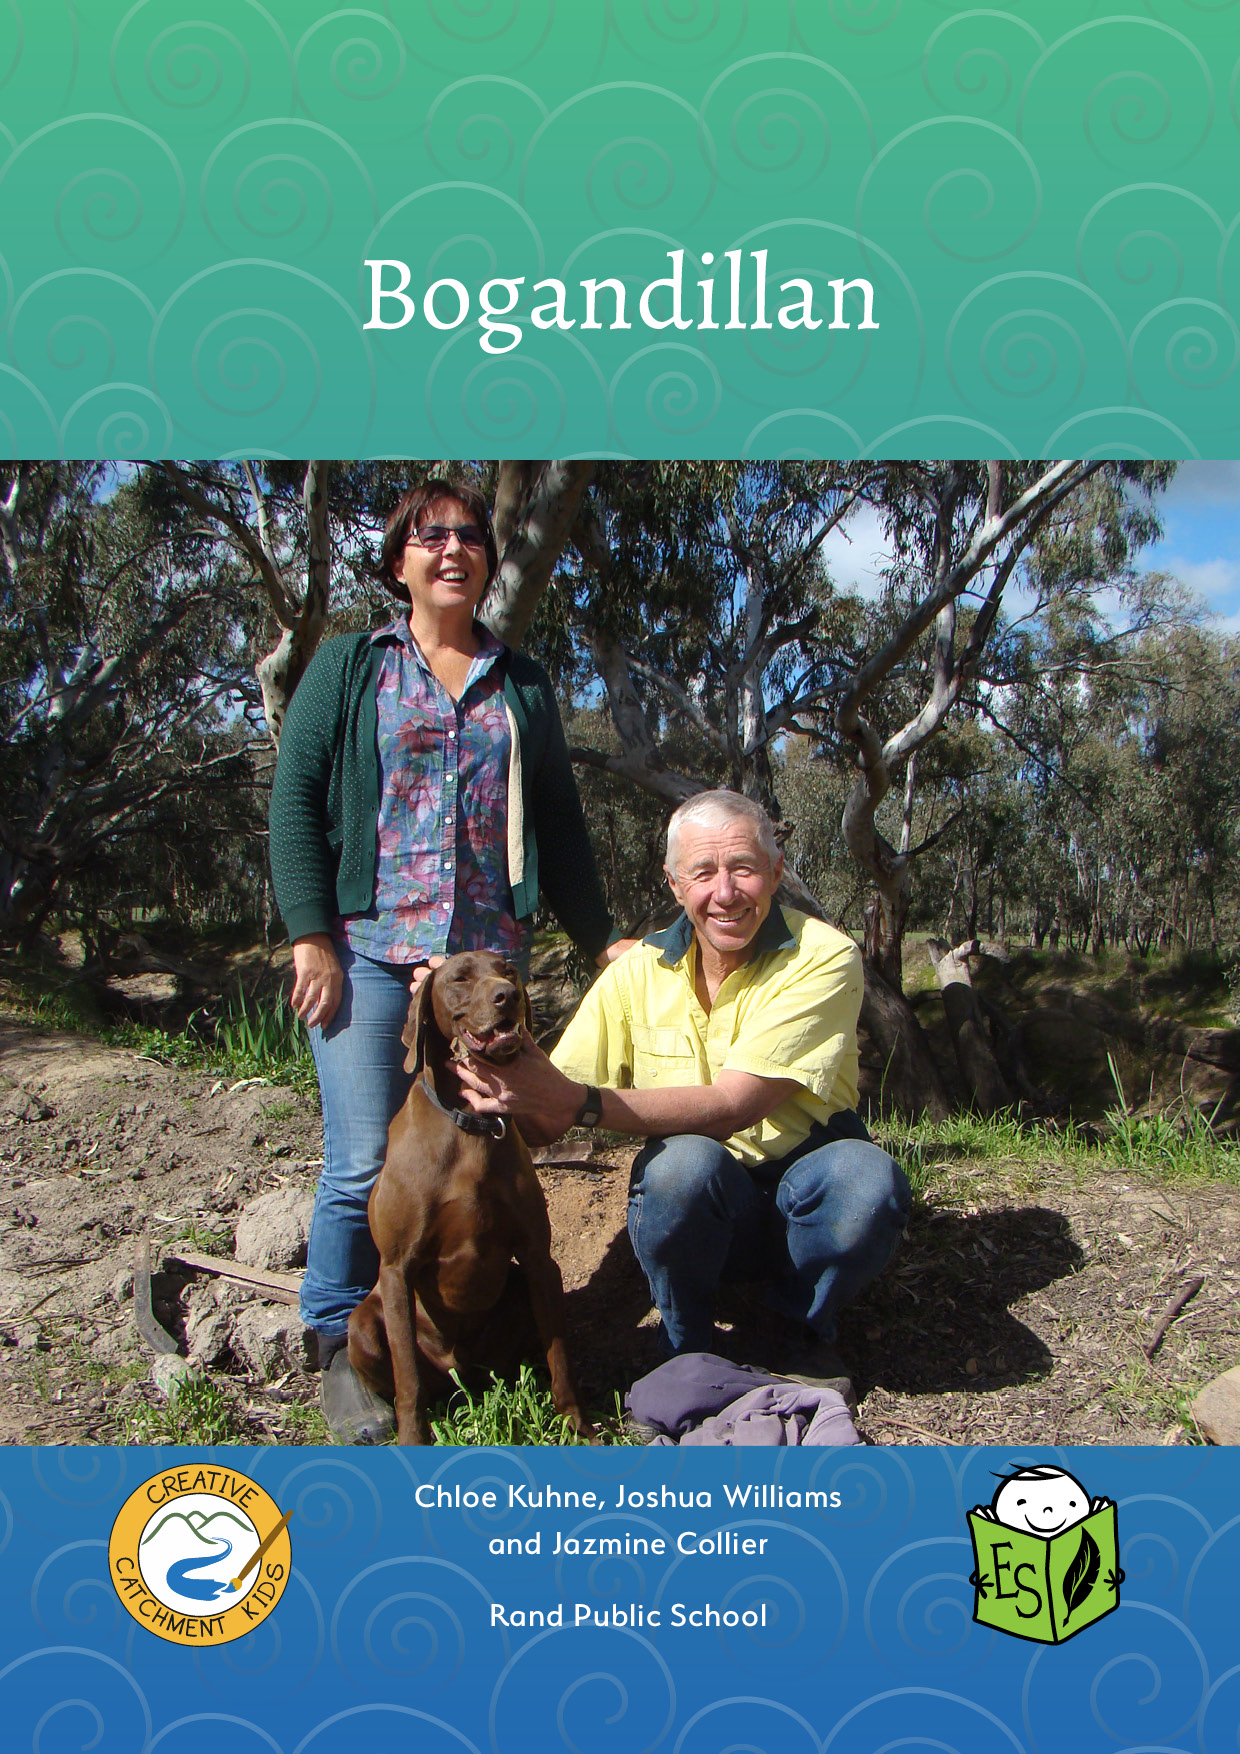 Bogandillan